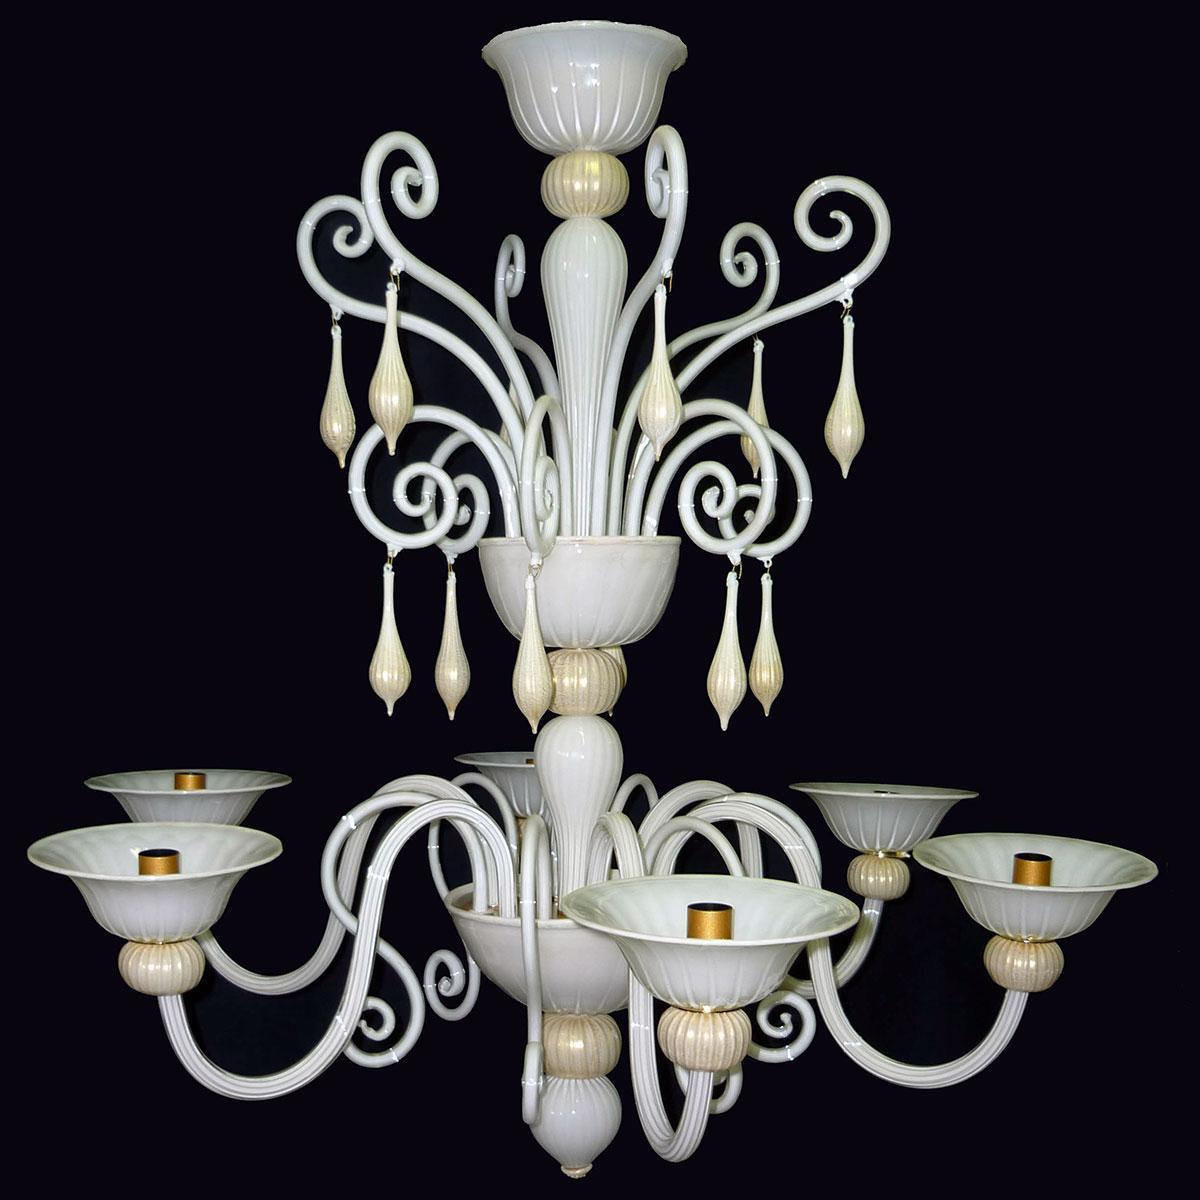 """Riccio Bianco"" Murano glass chandelier - 6 lights"